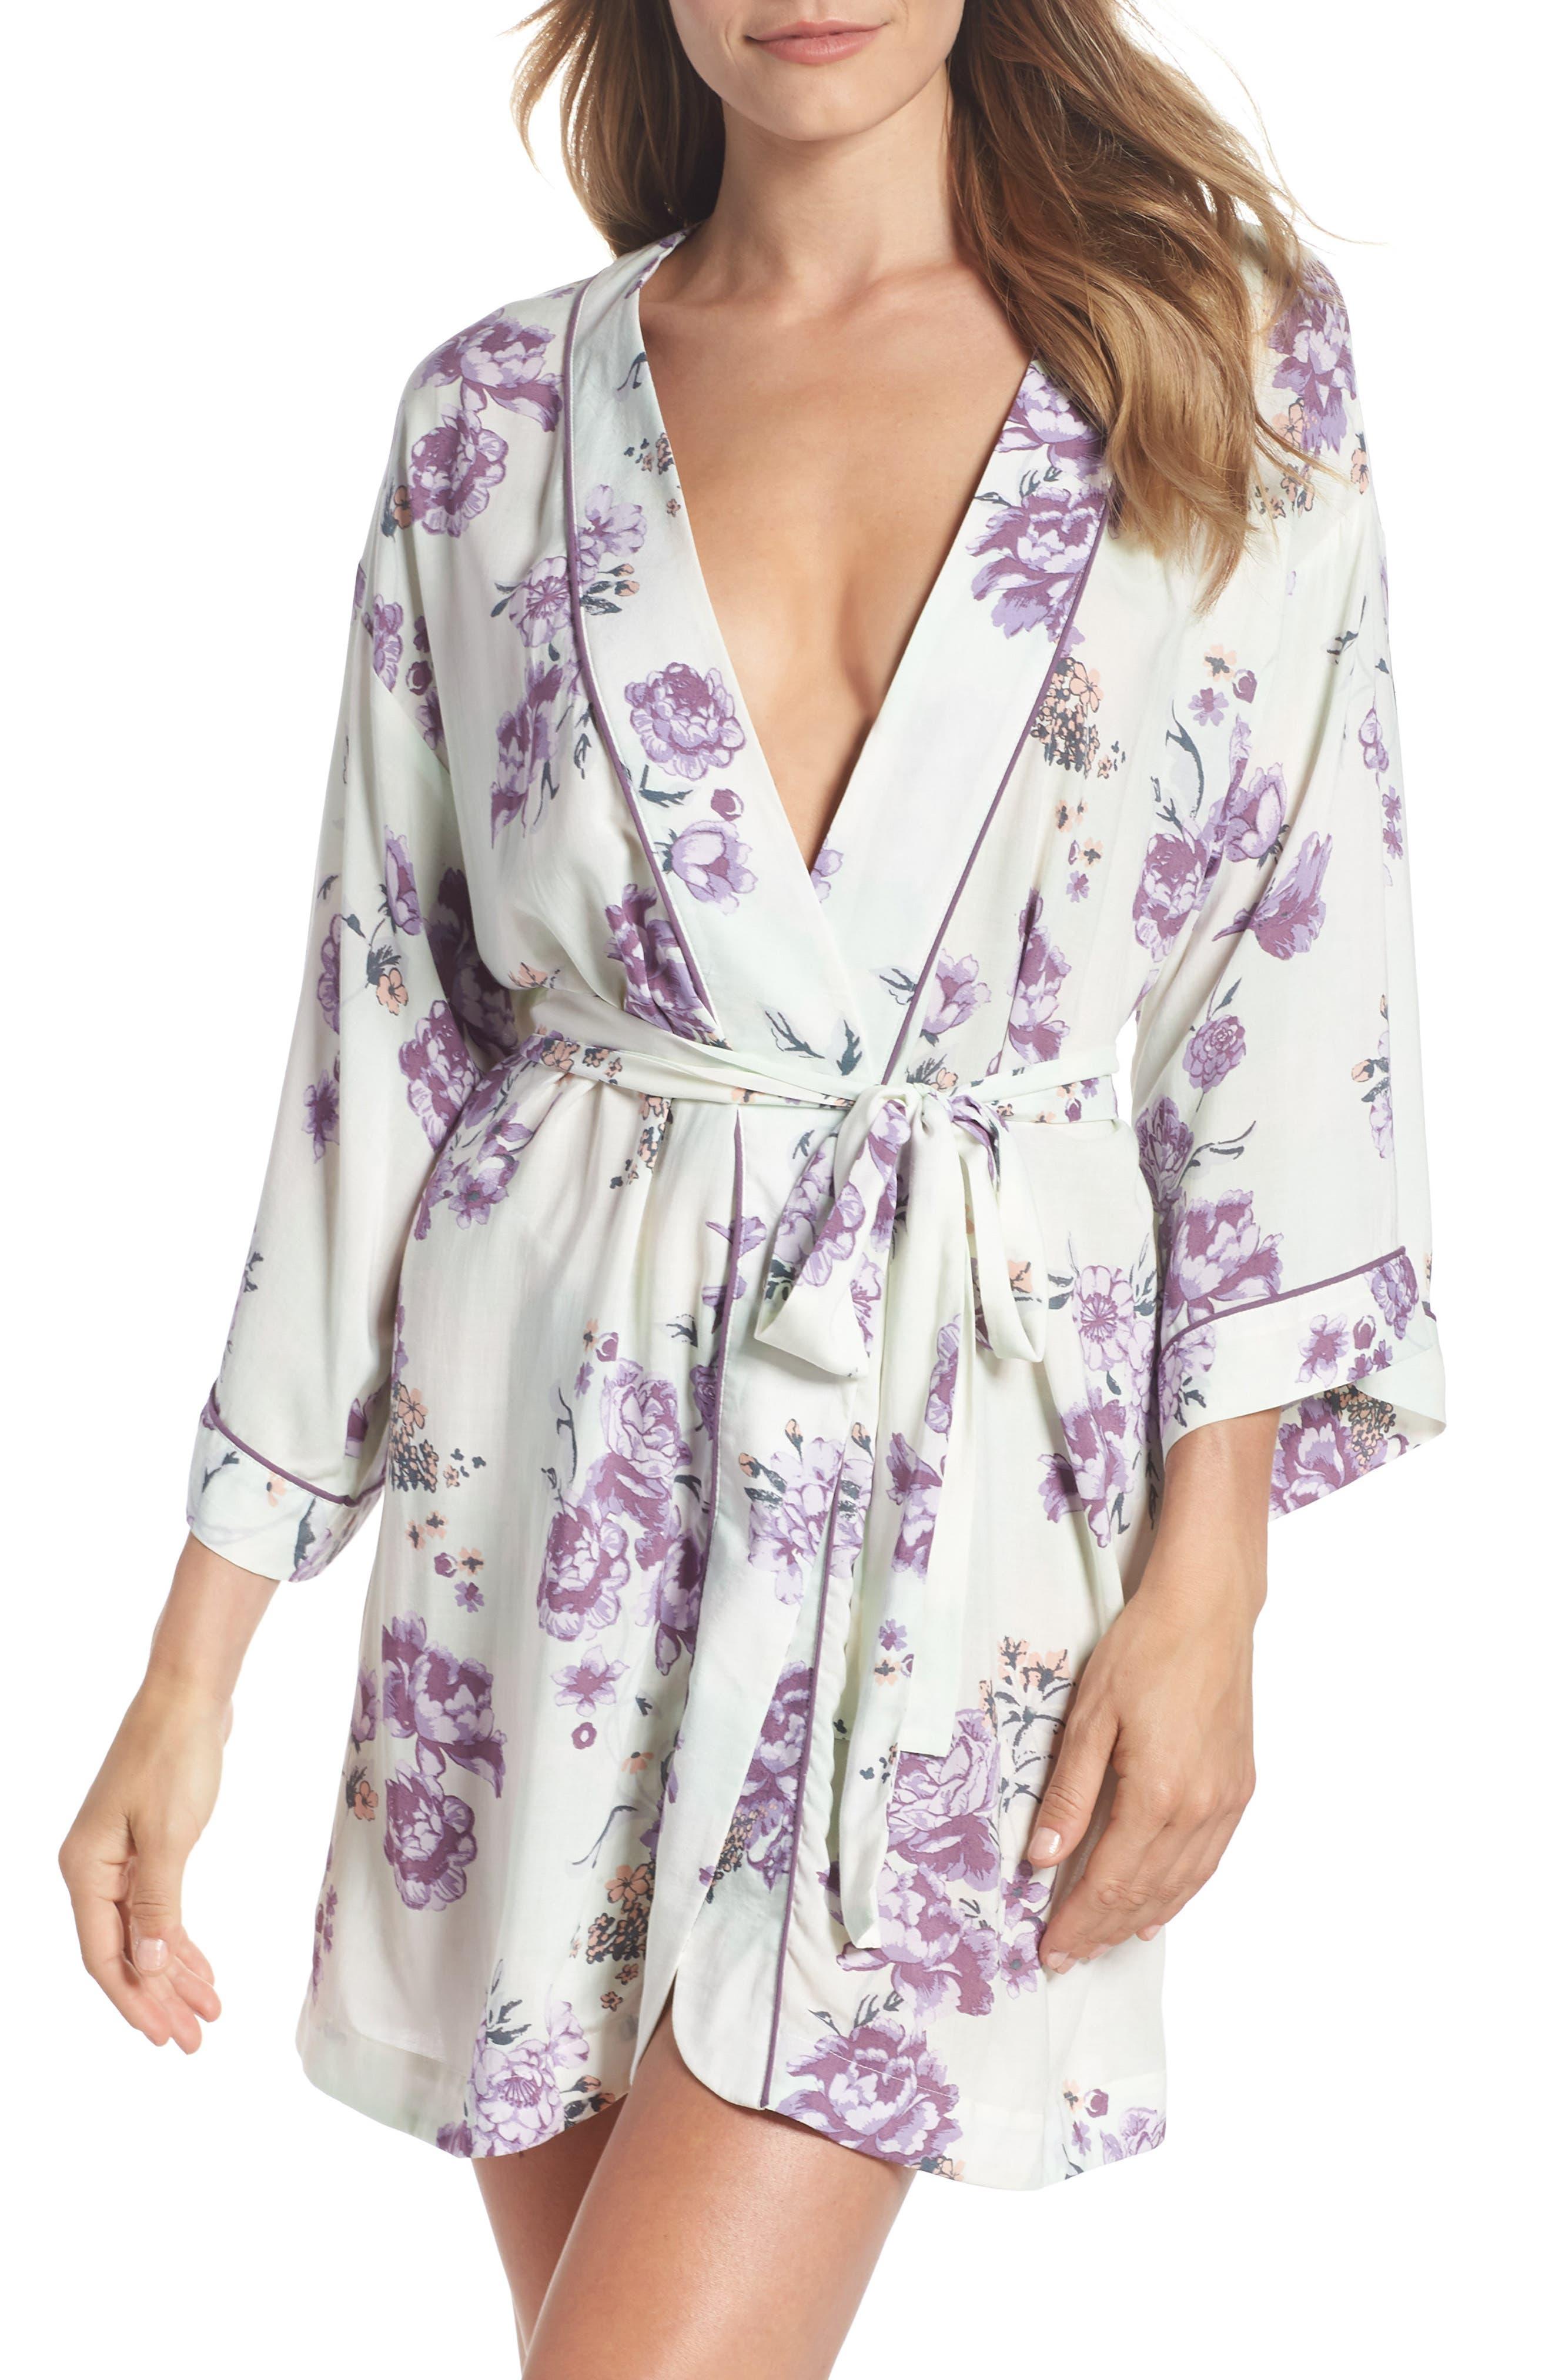 Main Image - Nordstrom Lingerie Sweet Dreams Short Robe